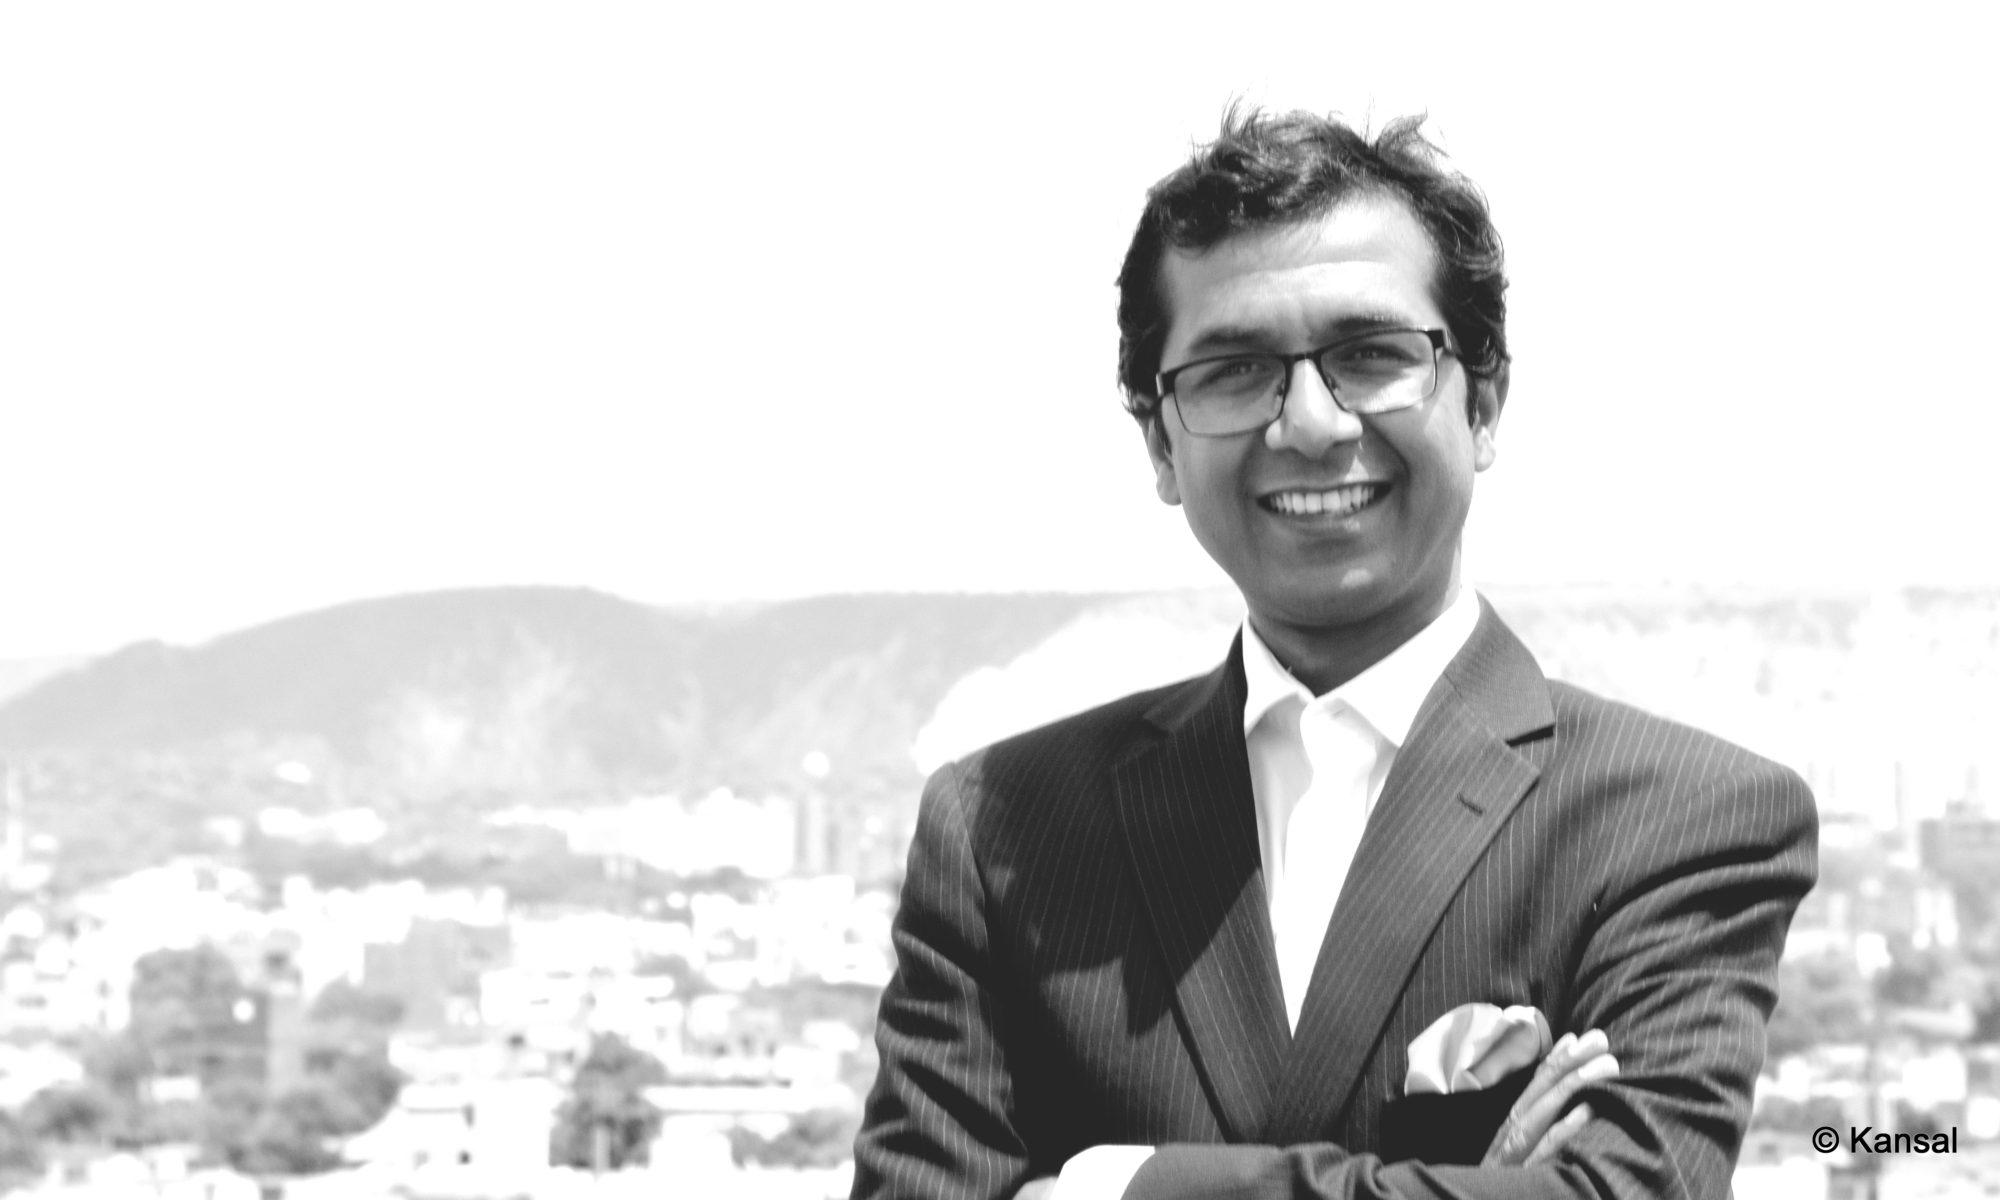 Shashank Kansal - Solves tough challenges. Improves success.